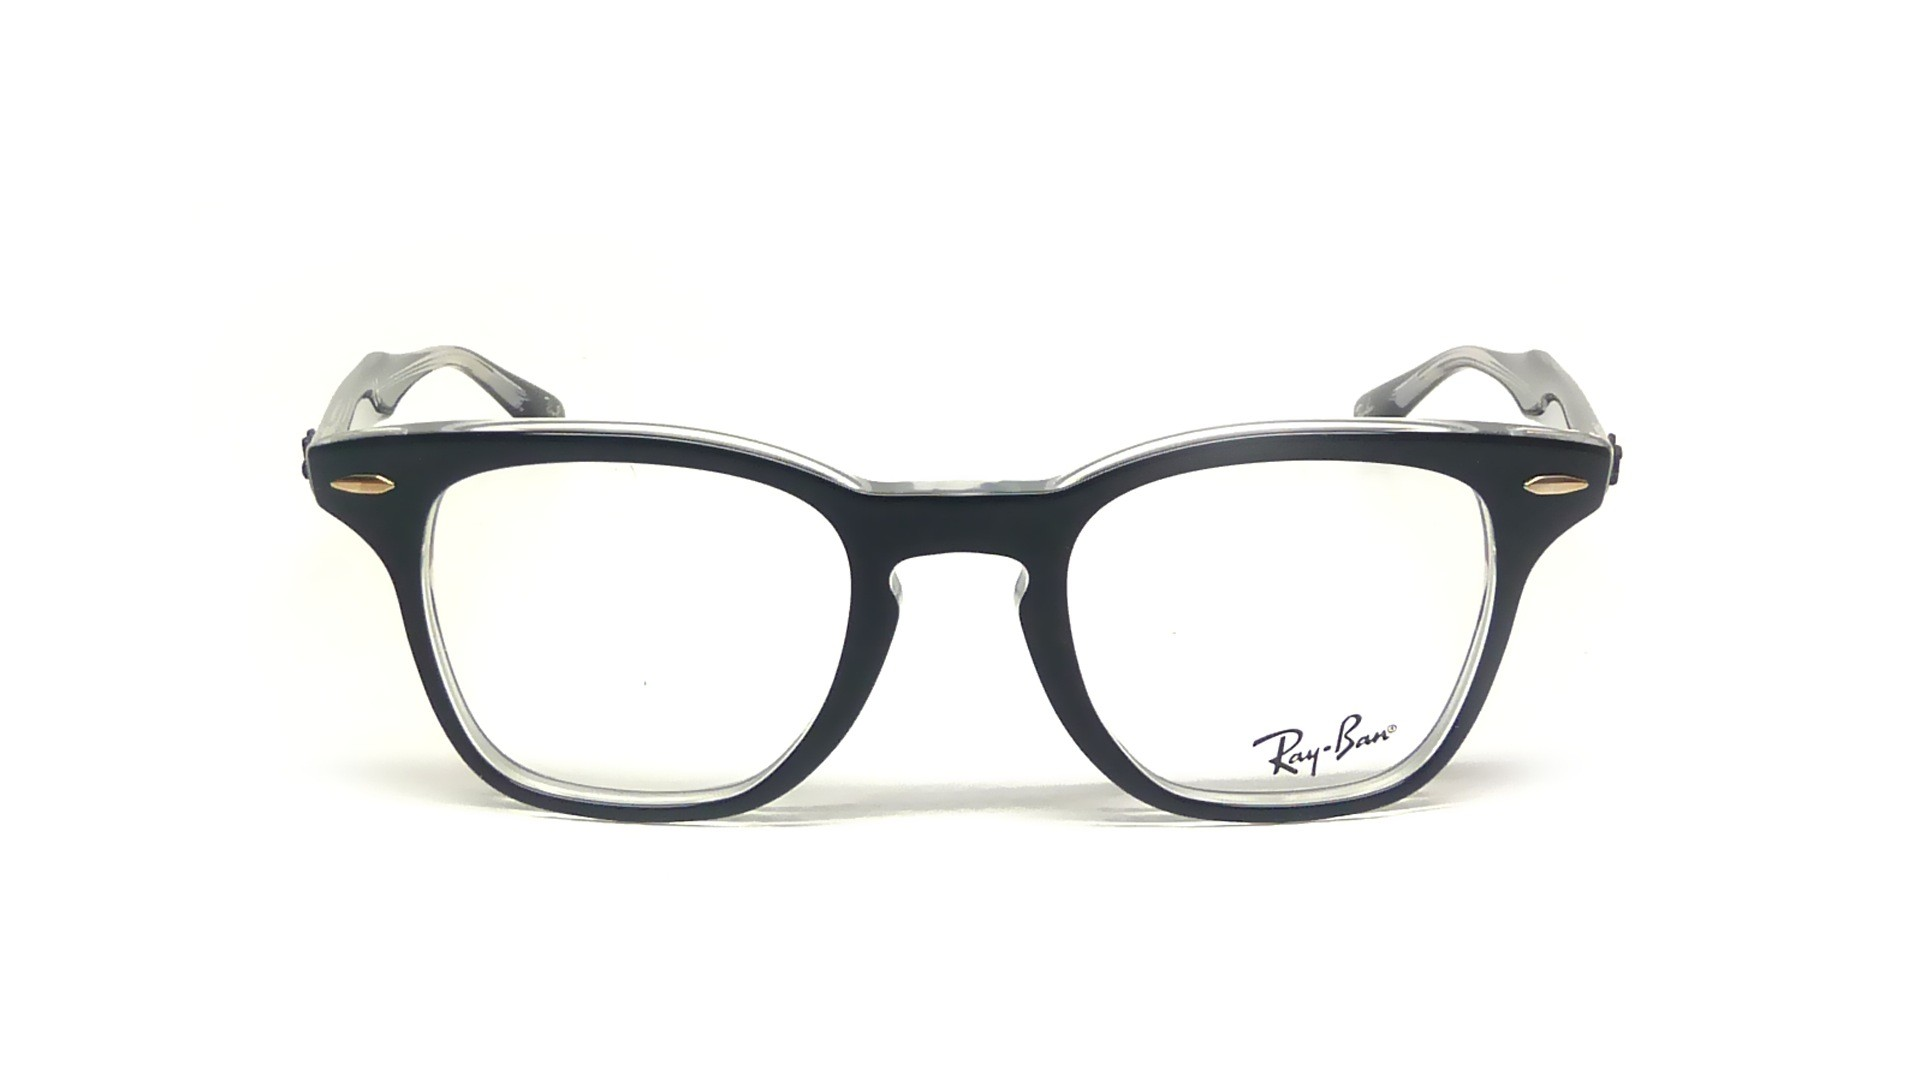 2e23b56613 Ray Ban Rx 5193 Eyeglasses « Heritage Malta